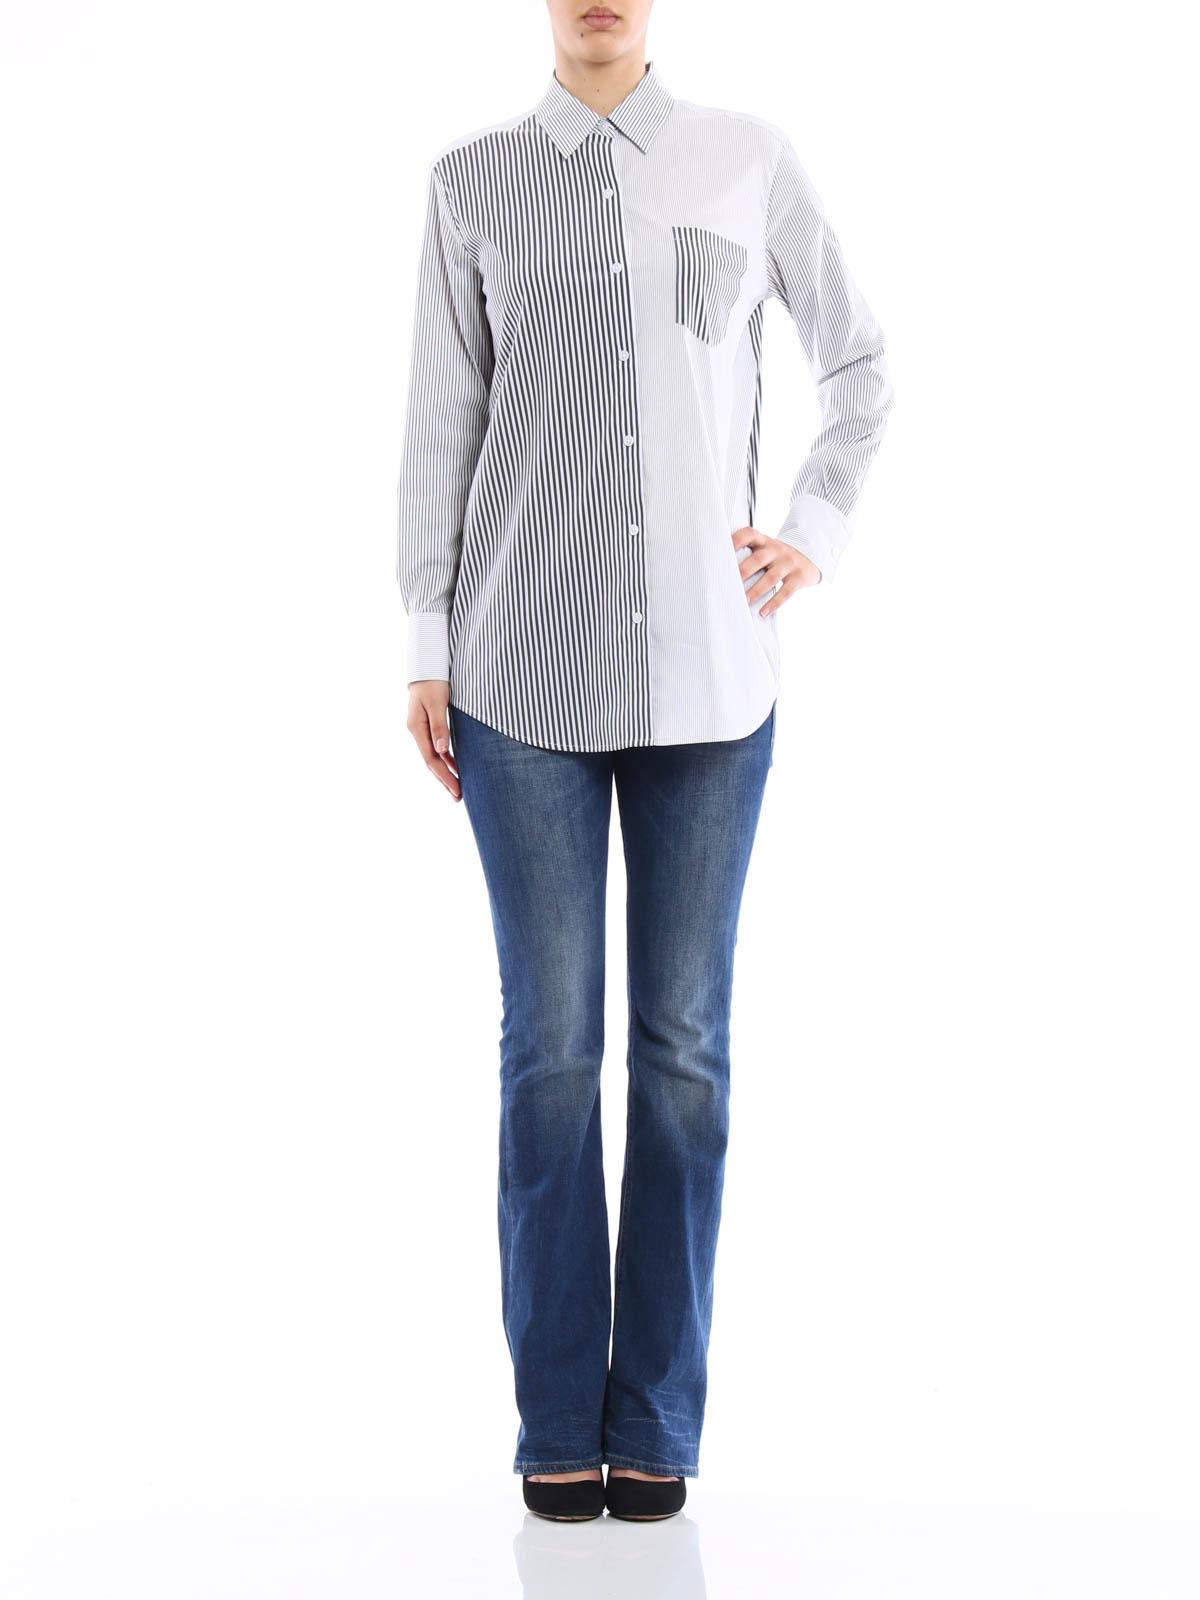 691abe17bb1c Dkny - Striped cotton shirt - Chemises - P4520035ES 001